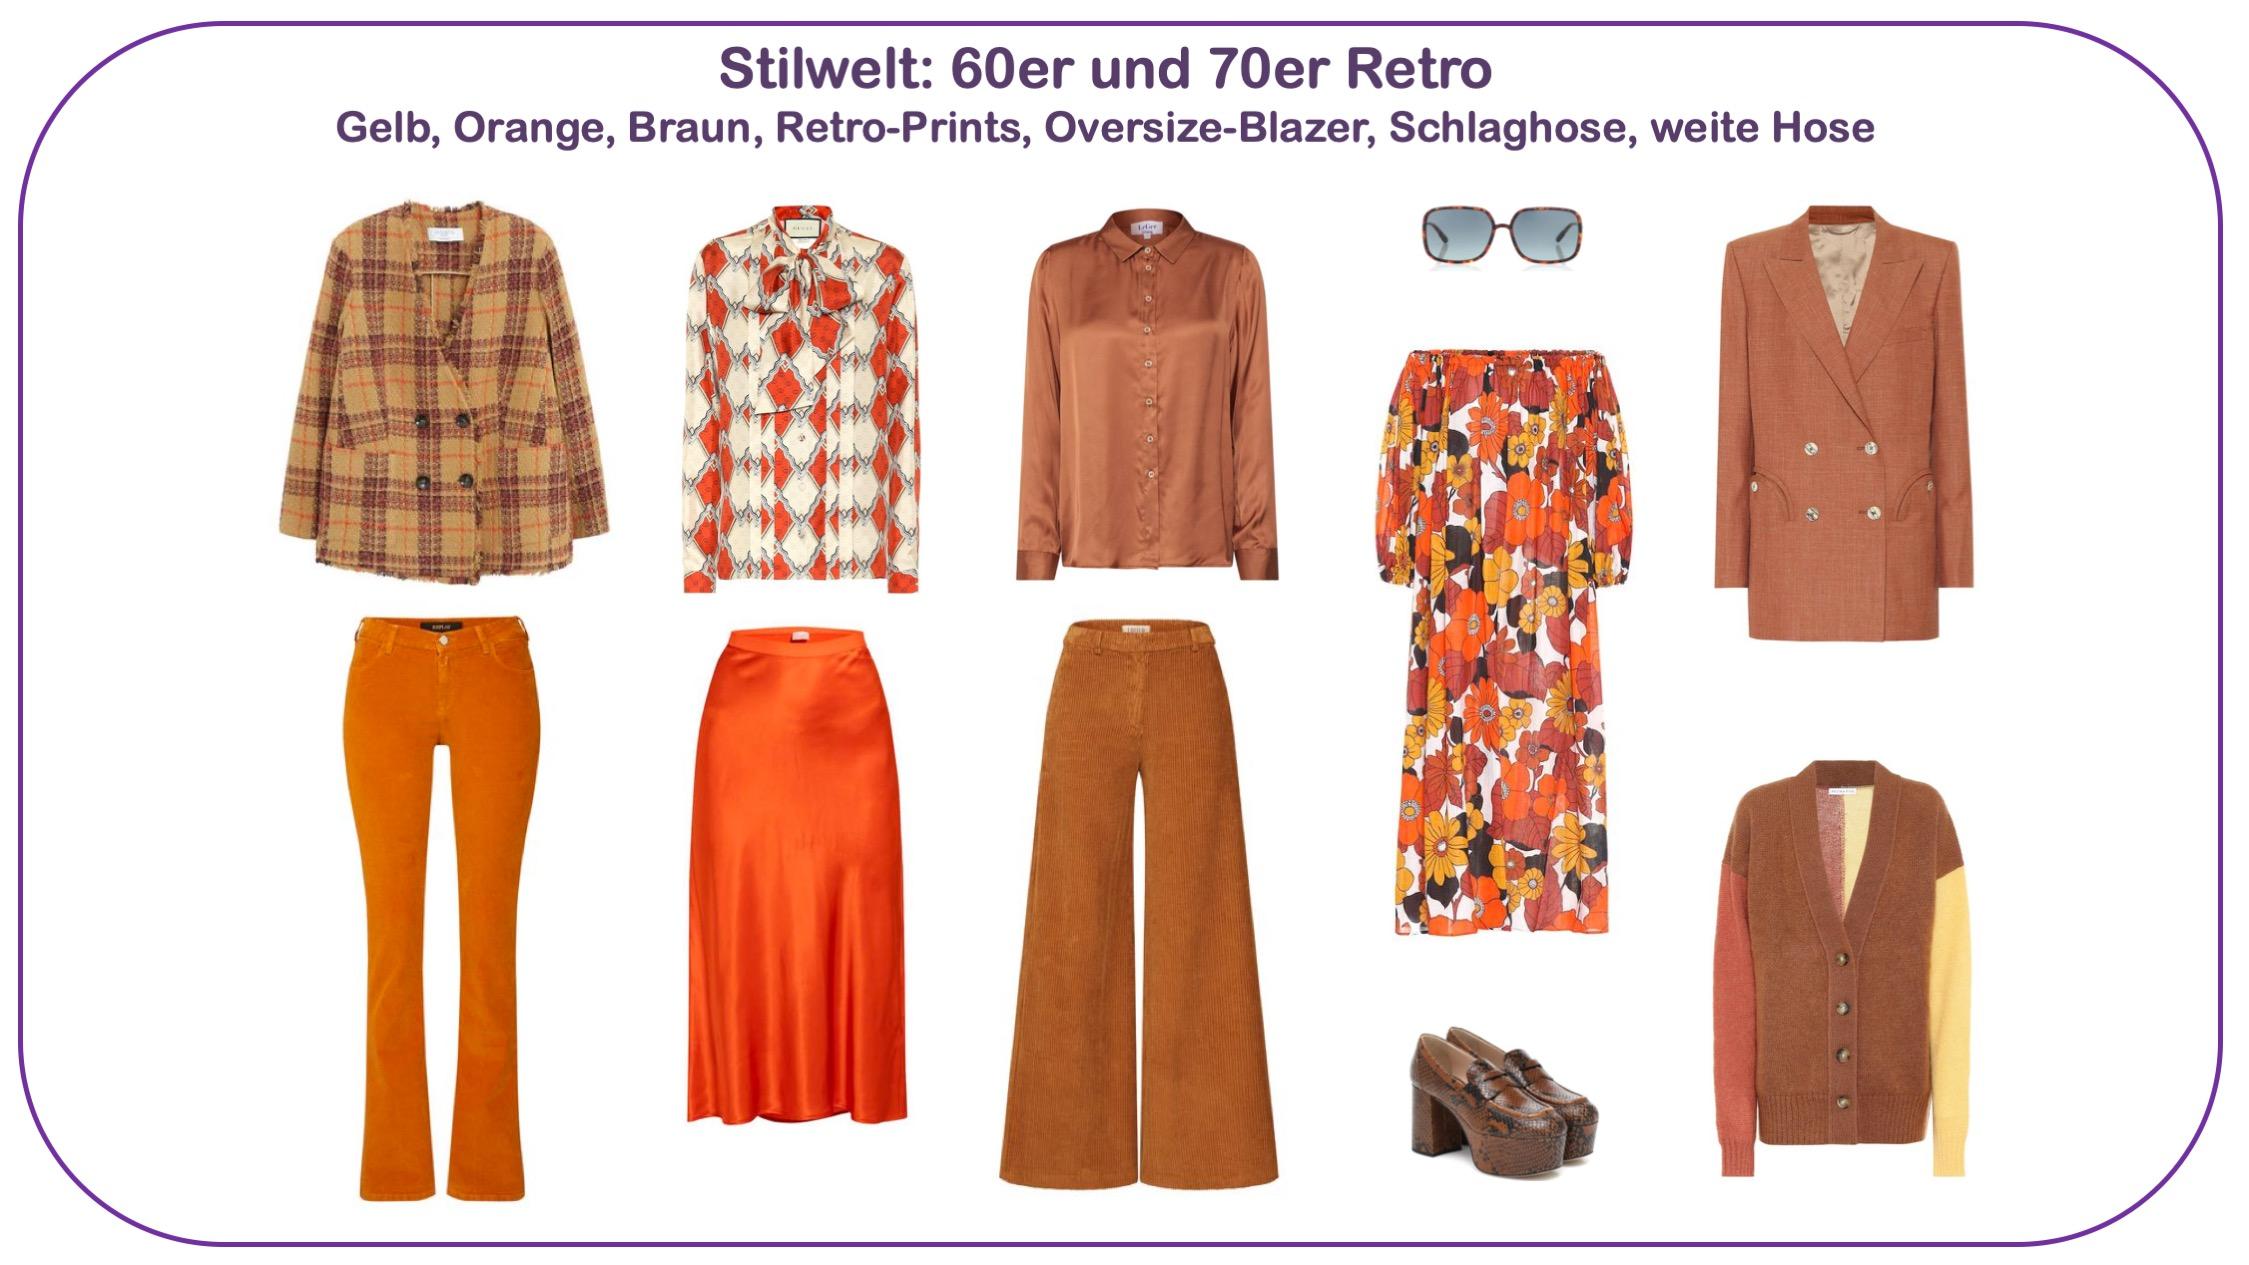 Modetrends Frühjahr/Sommer 2020 - Stilwelt Retro